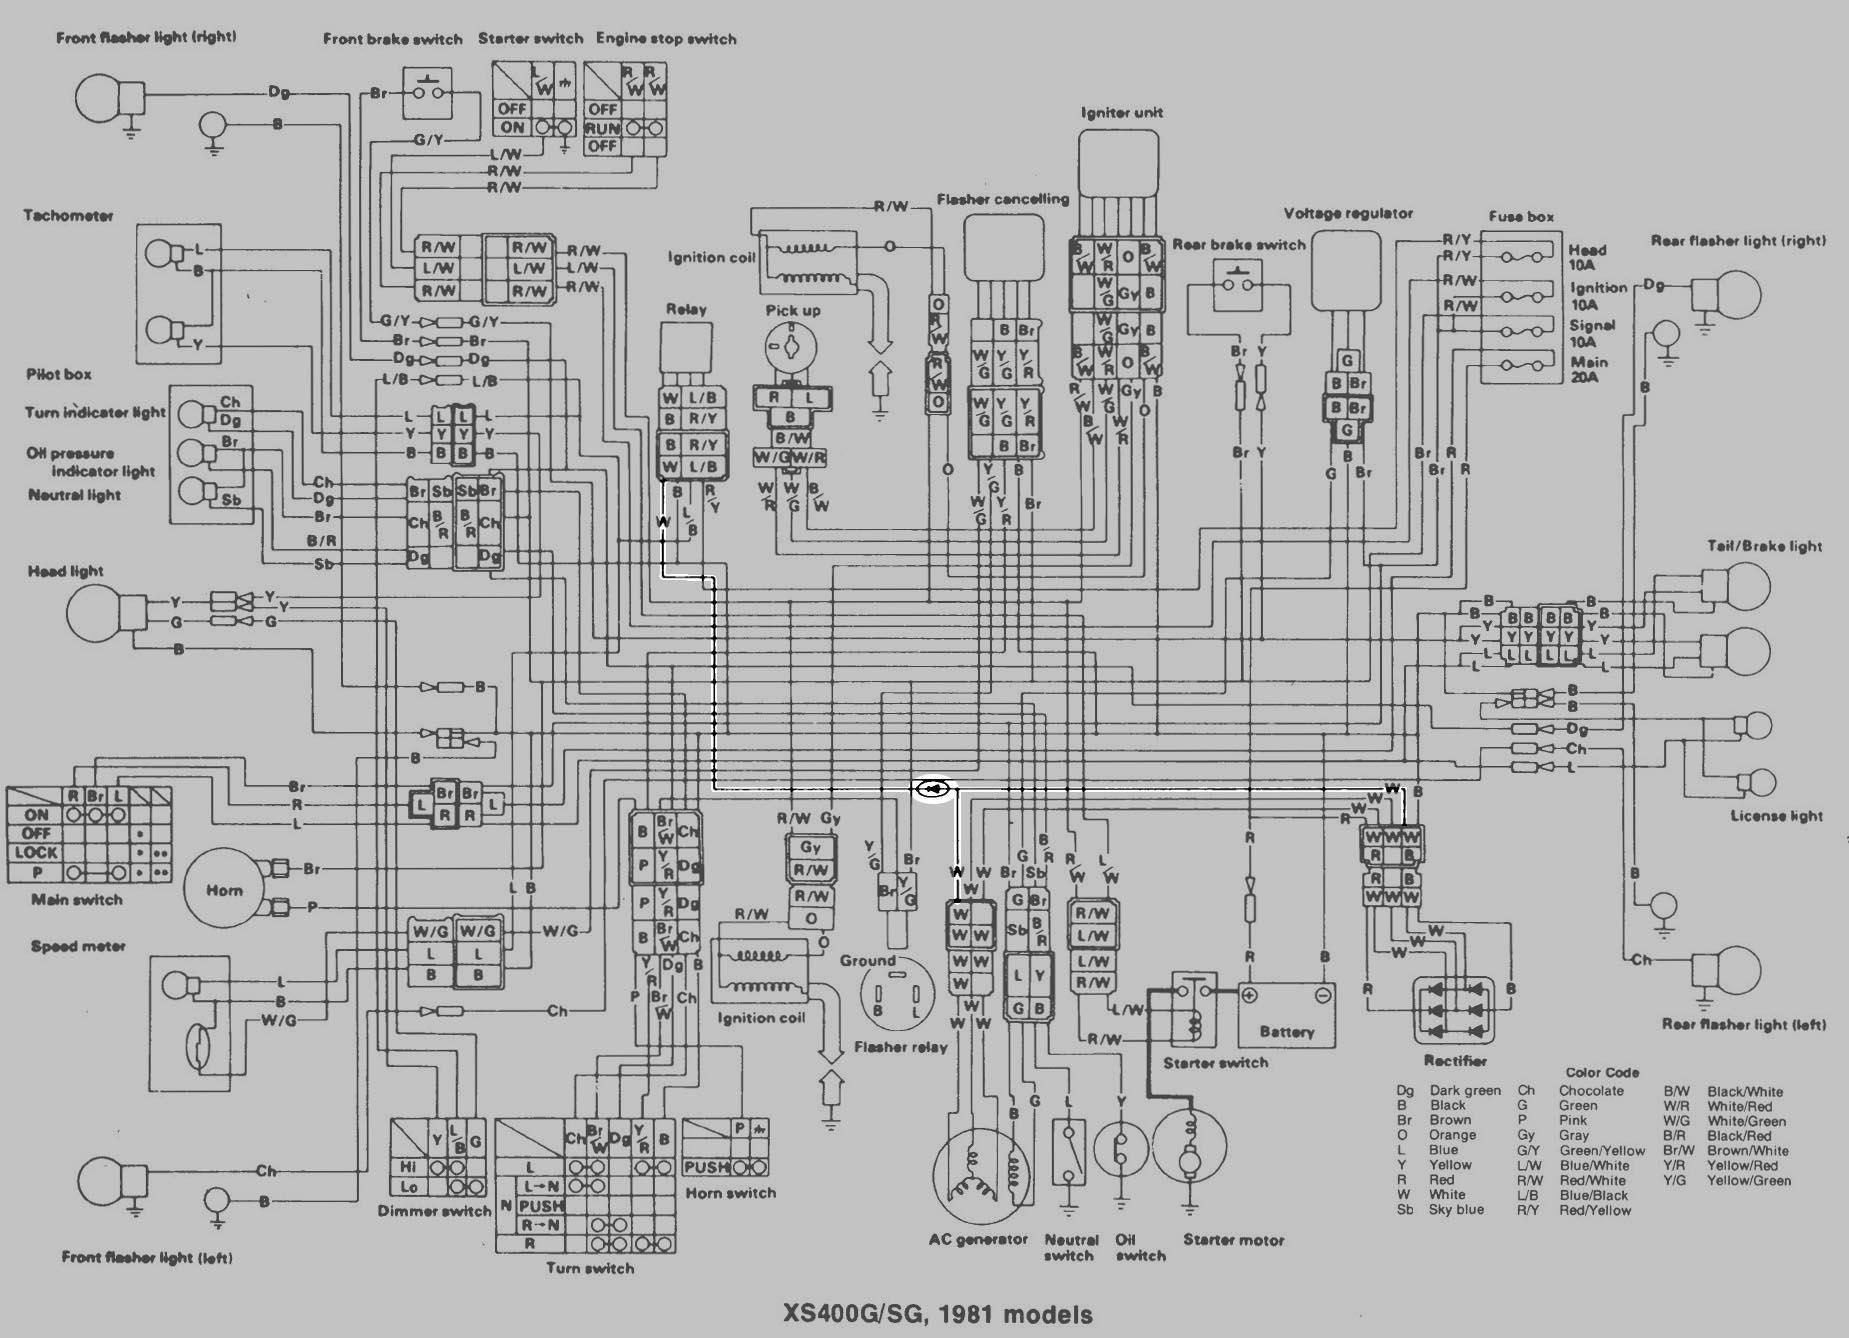 [SCHEMATICS_4HG]  VL_4941] Kz1000 Wiring Diagram Yamaha Xs400 Schematic Wiring | 1986 Kz1000 Wiring Diagram |  | Garna Terst Targ Gram Cosm Exmet Mohammedshrine Librar Wiring 101